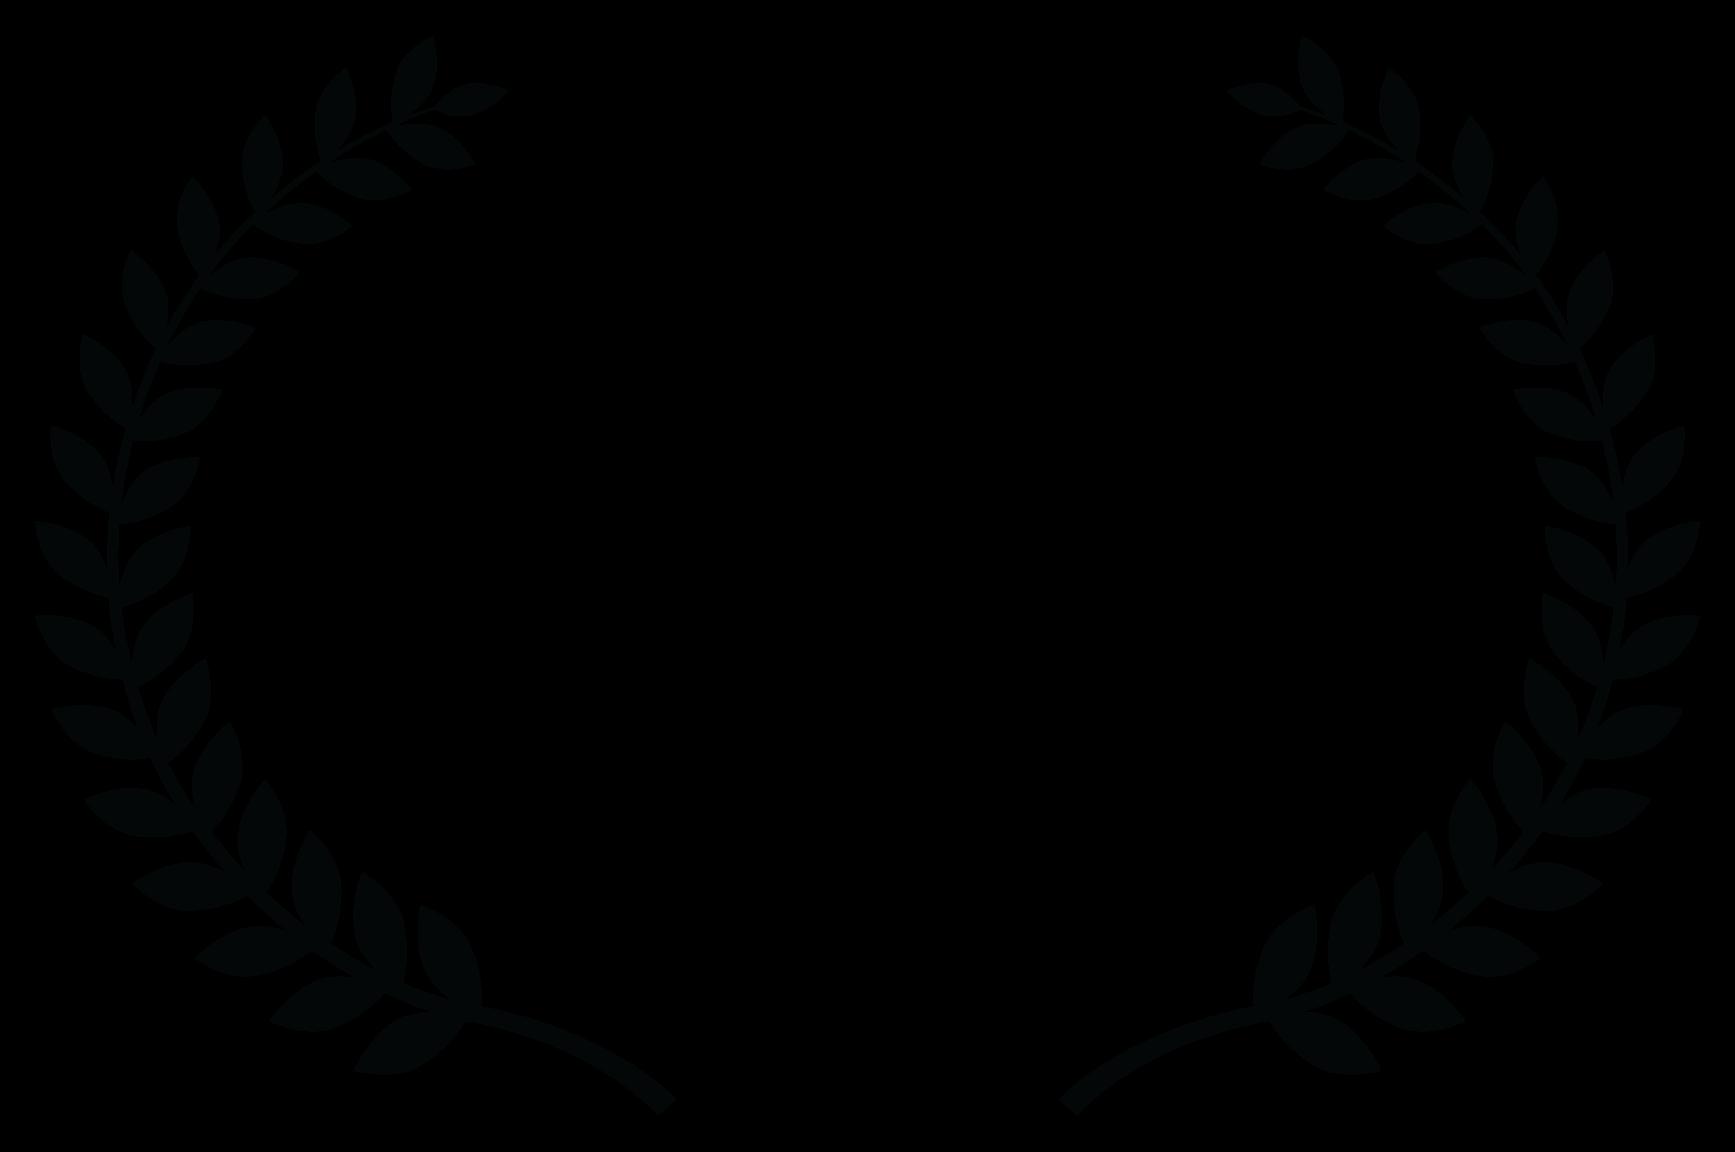 OFFICIAL SELECTION - CRASH - INTERNATIONAL FANTASTIC FILM FESTIVAL - 2018